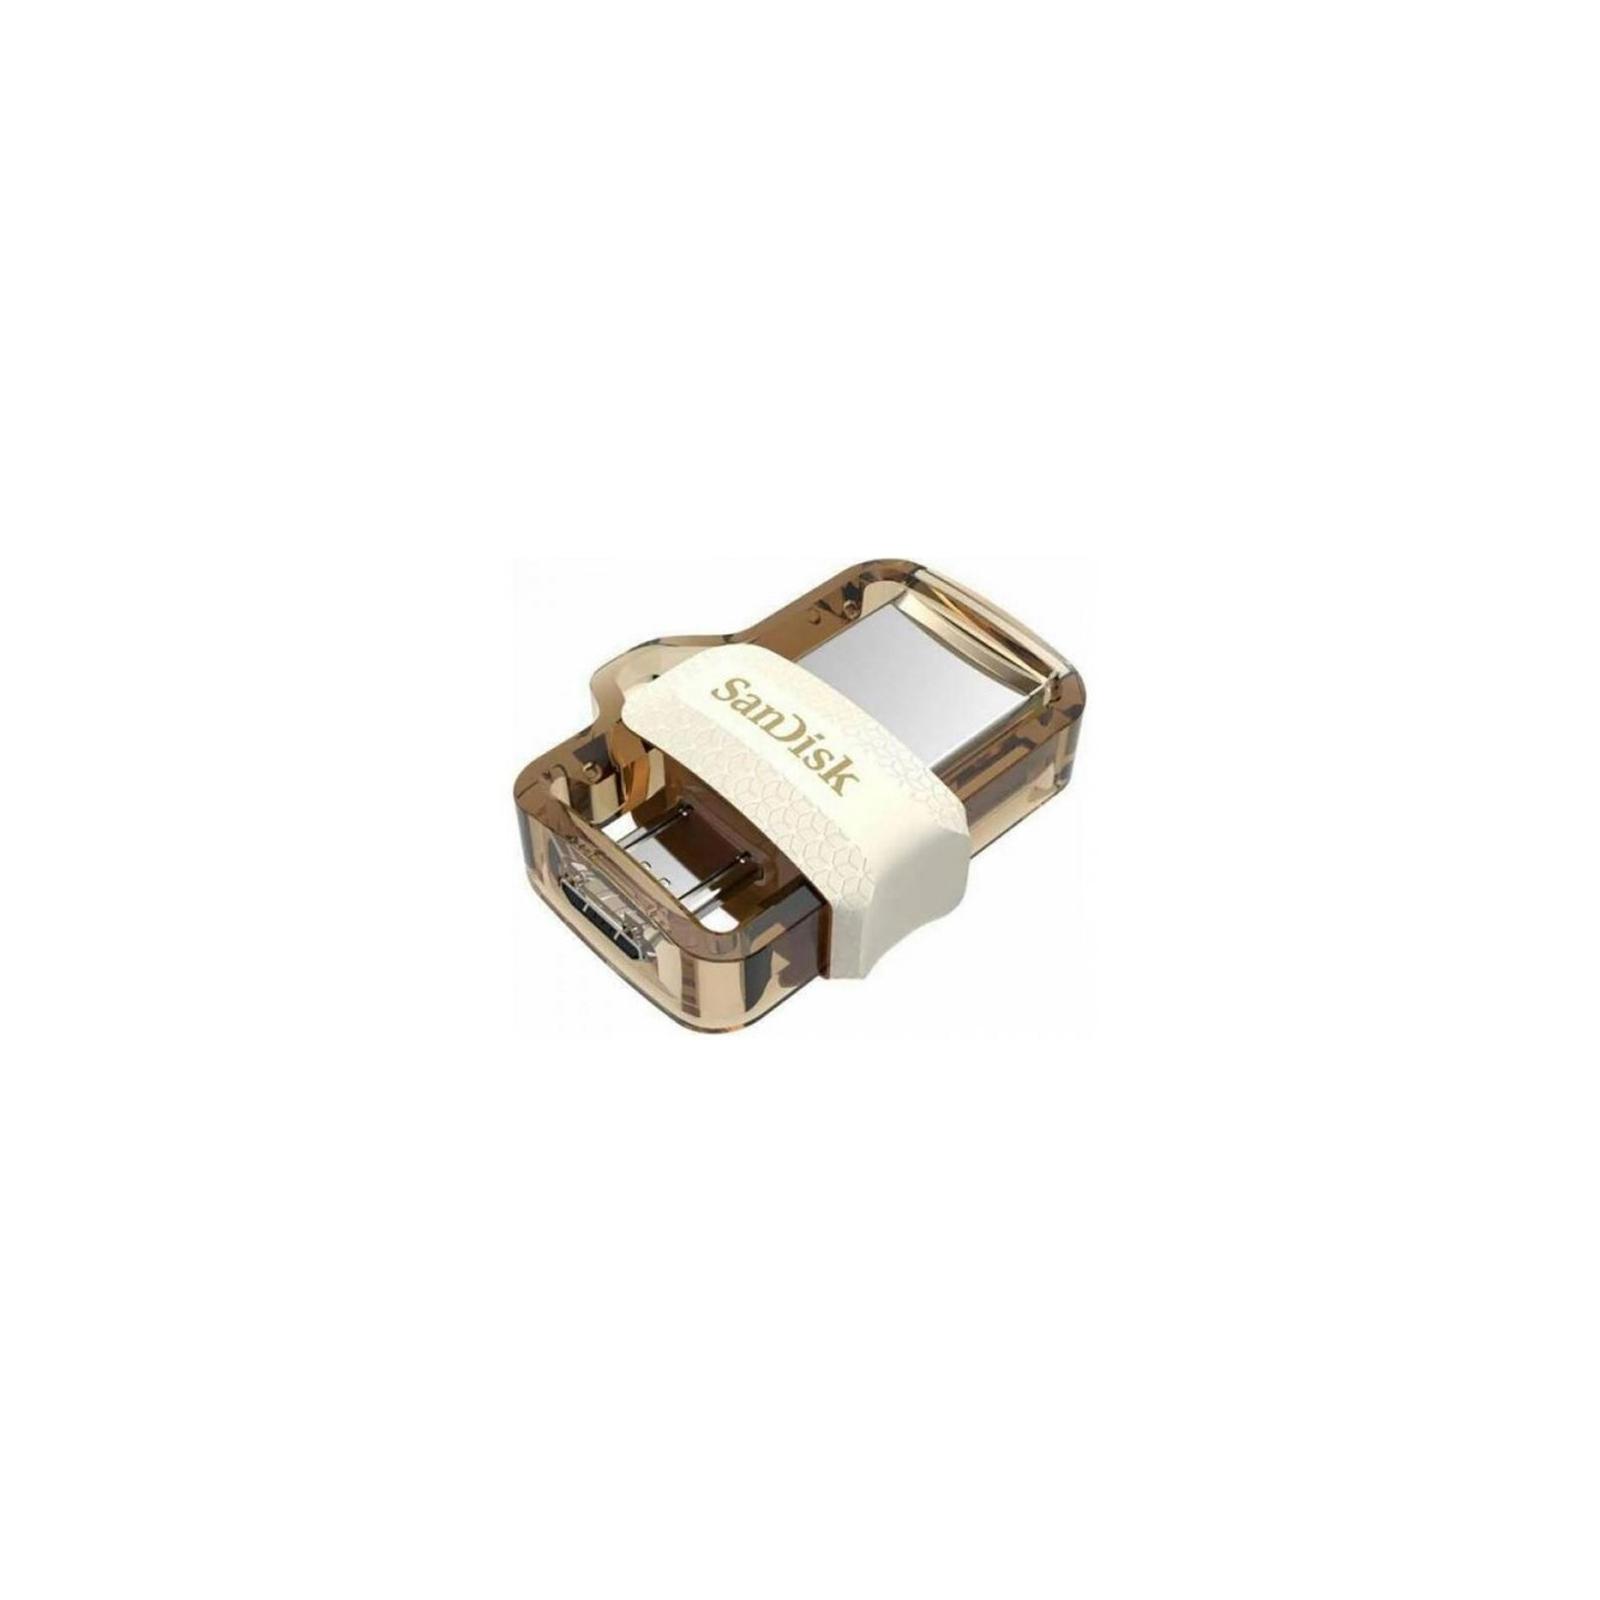 USB флеш накопитель SanDisk 128GB Ultra Dual Drive M3.0 USB 3.0 (SDDD3-128G-G46) изображение 2